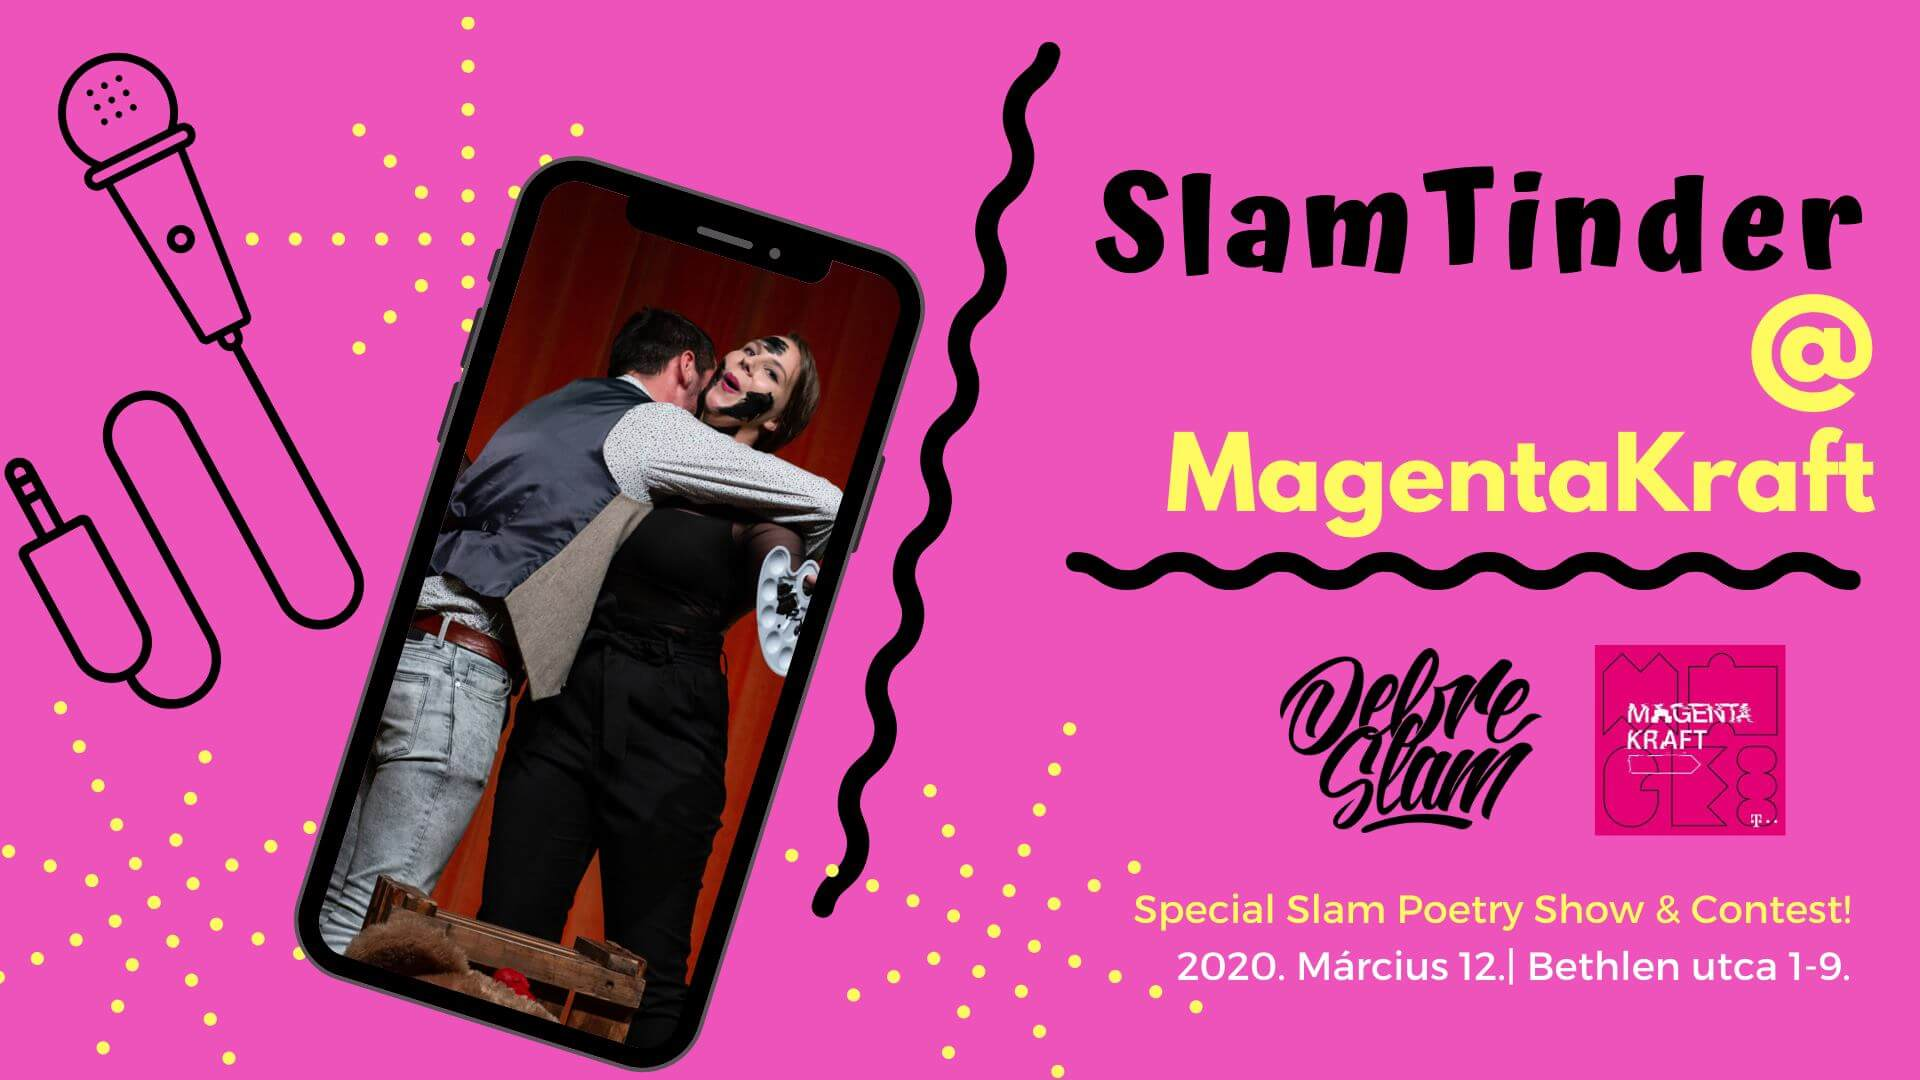 SlamTinder @MagentaKraft ELHALASZTVA/POSTPONED